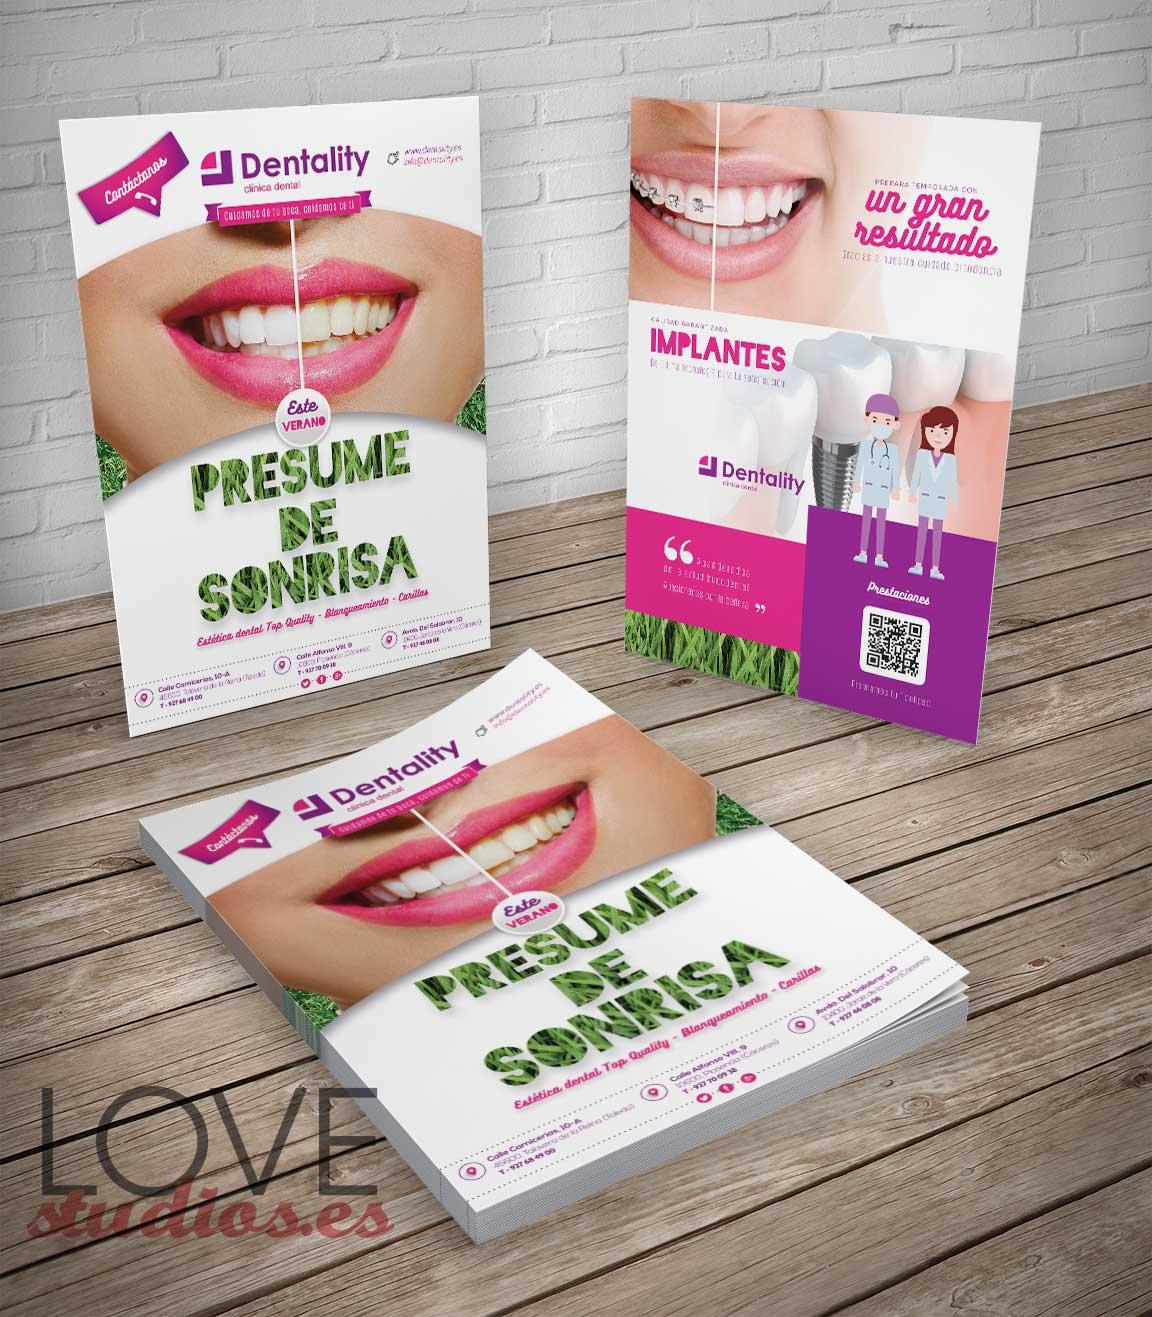 flyer-promocion-dentality-lovestudios